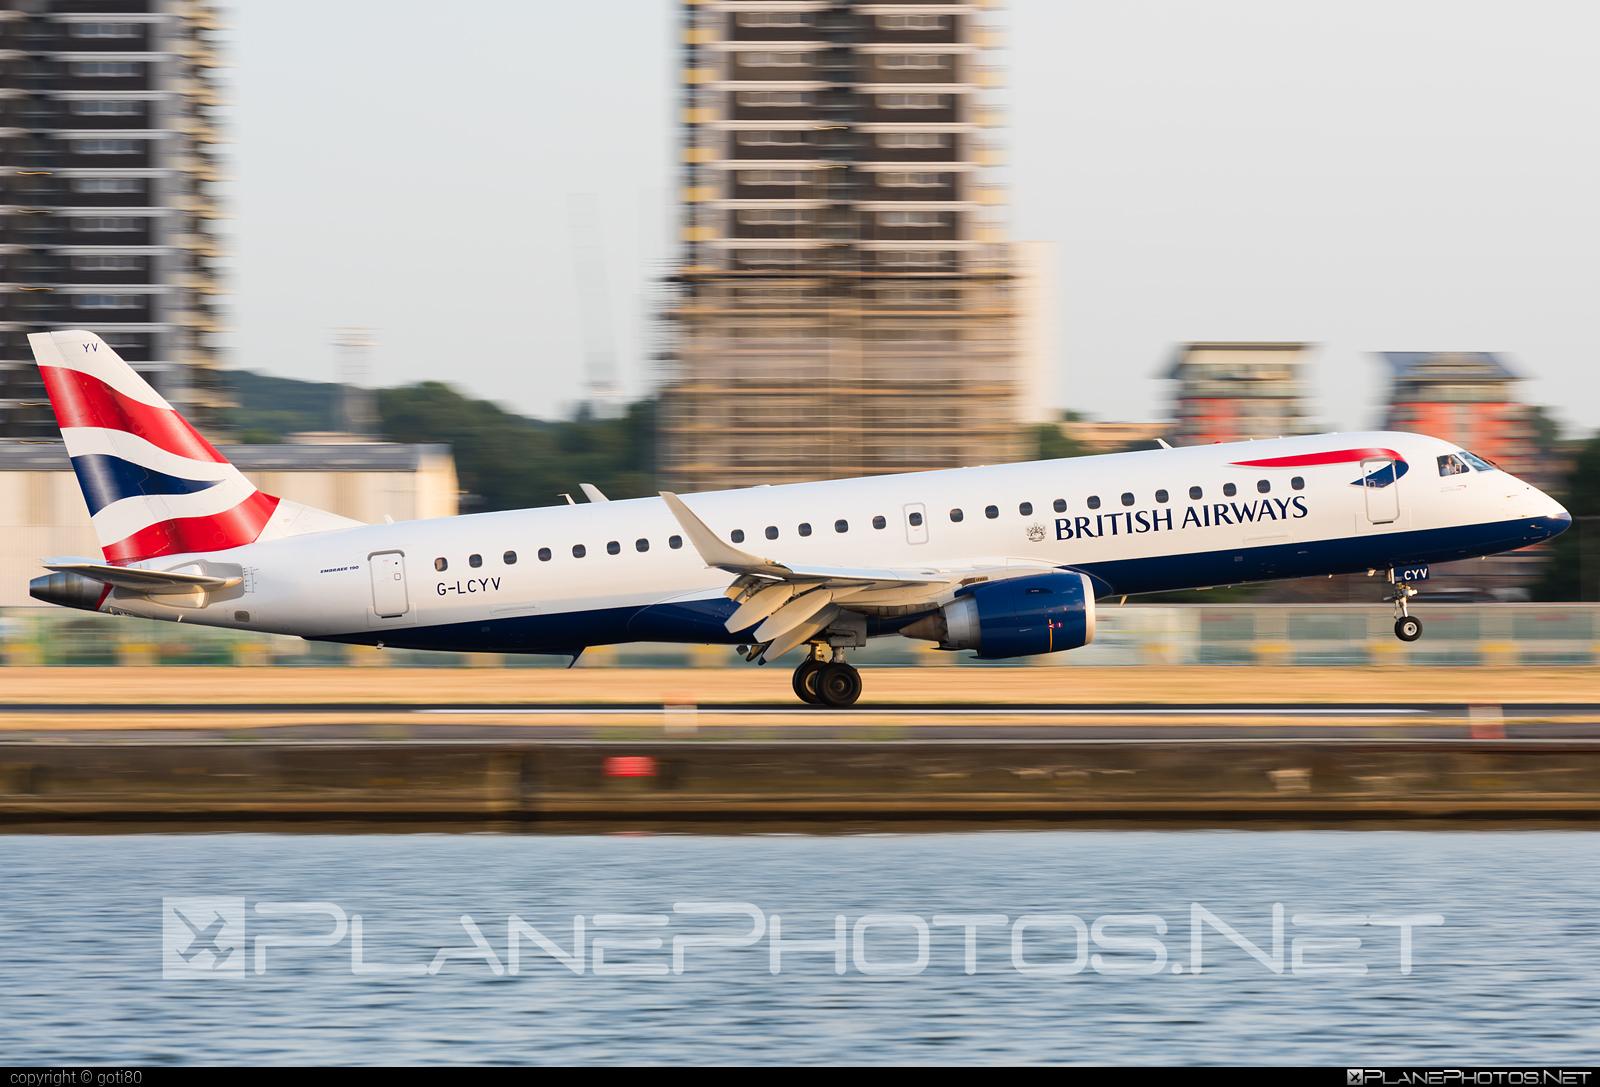 Embraer E190SR (ERJ-190-100SR) - G-LCYV operated by BA CityFlyer #e190 #e190100 #e190100sr #e190sr #embraer #embraer190 #embraer190100sr #embraer190sr